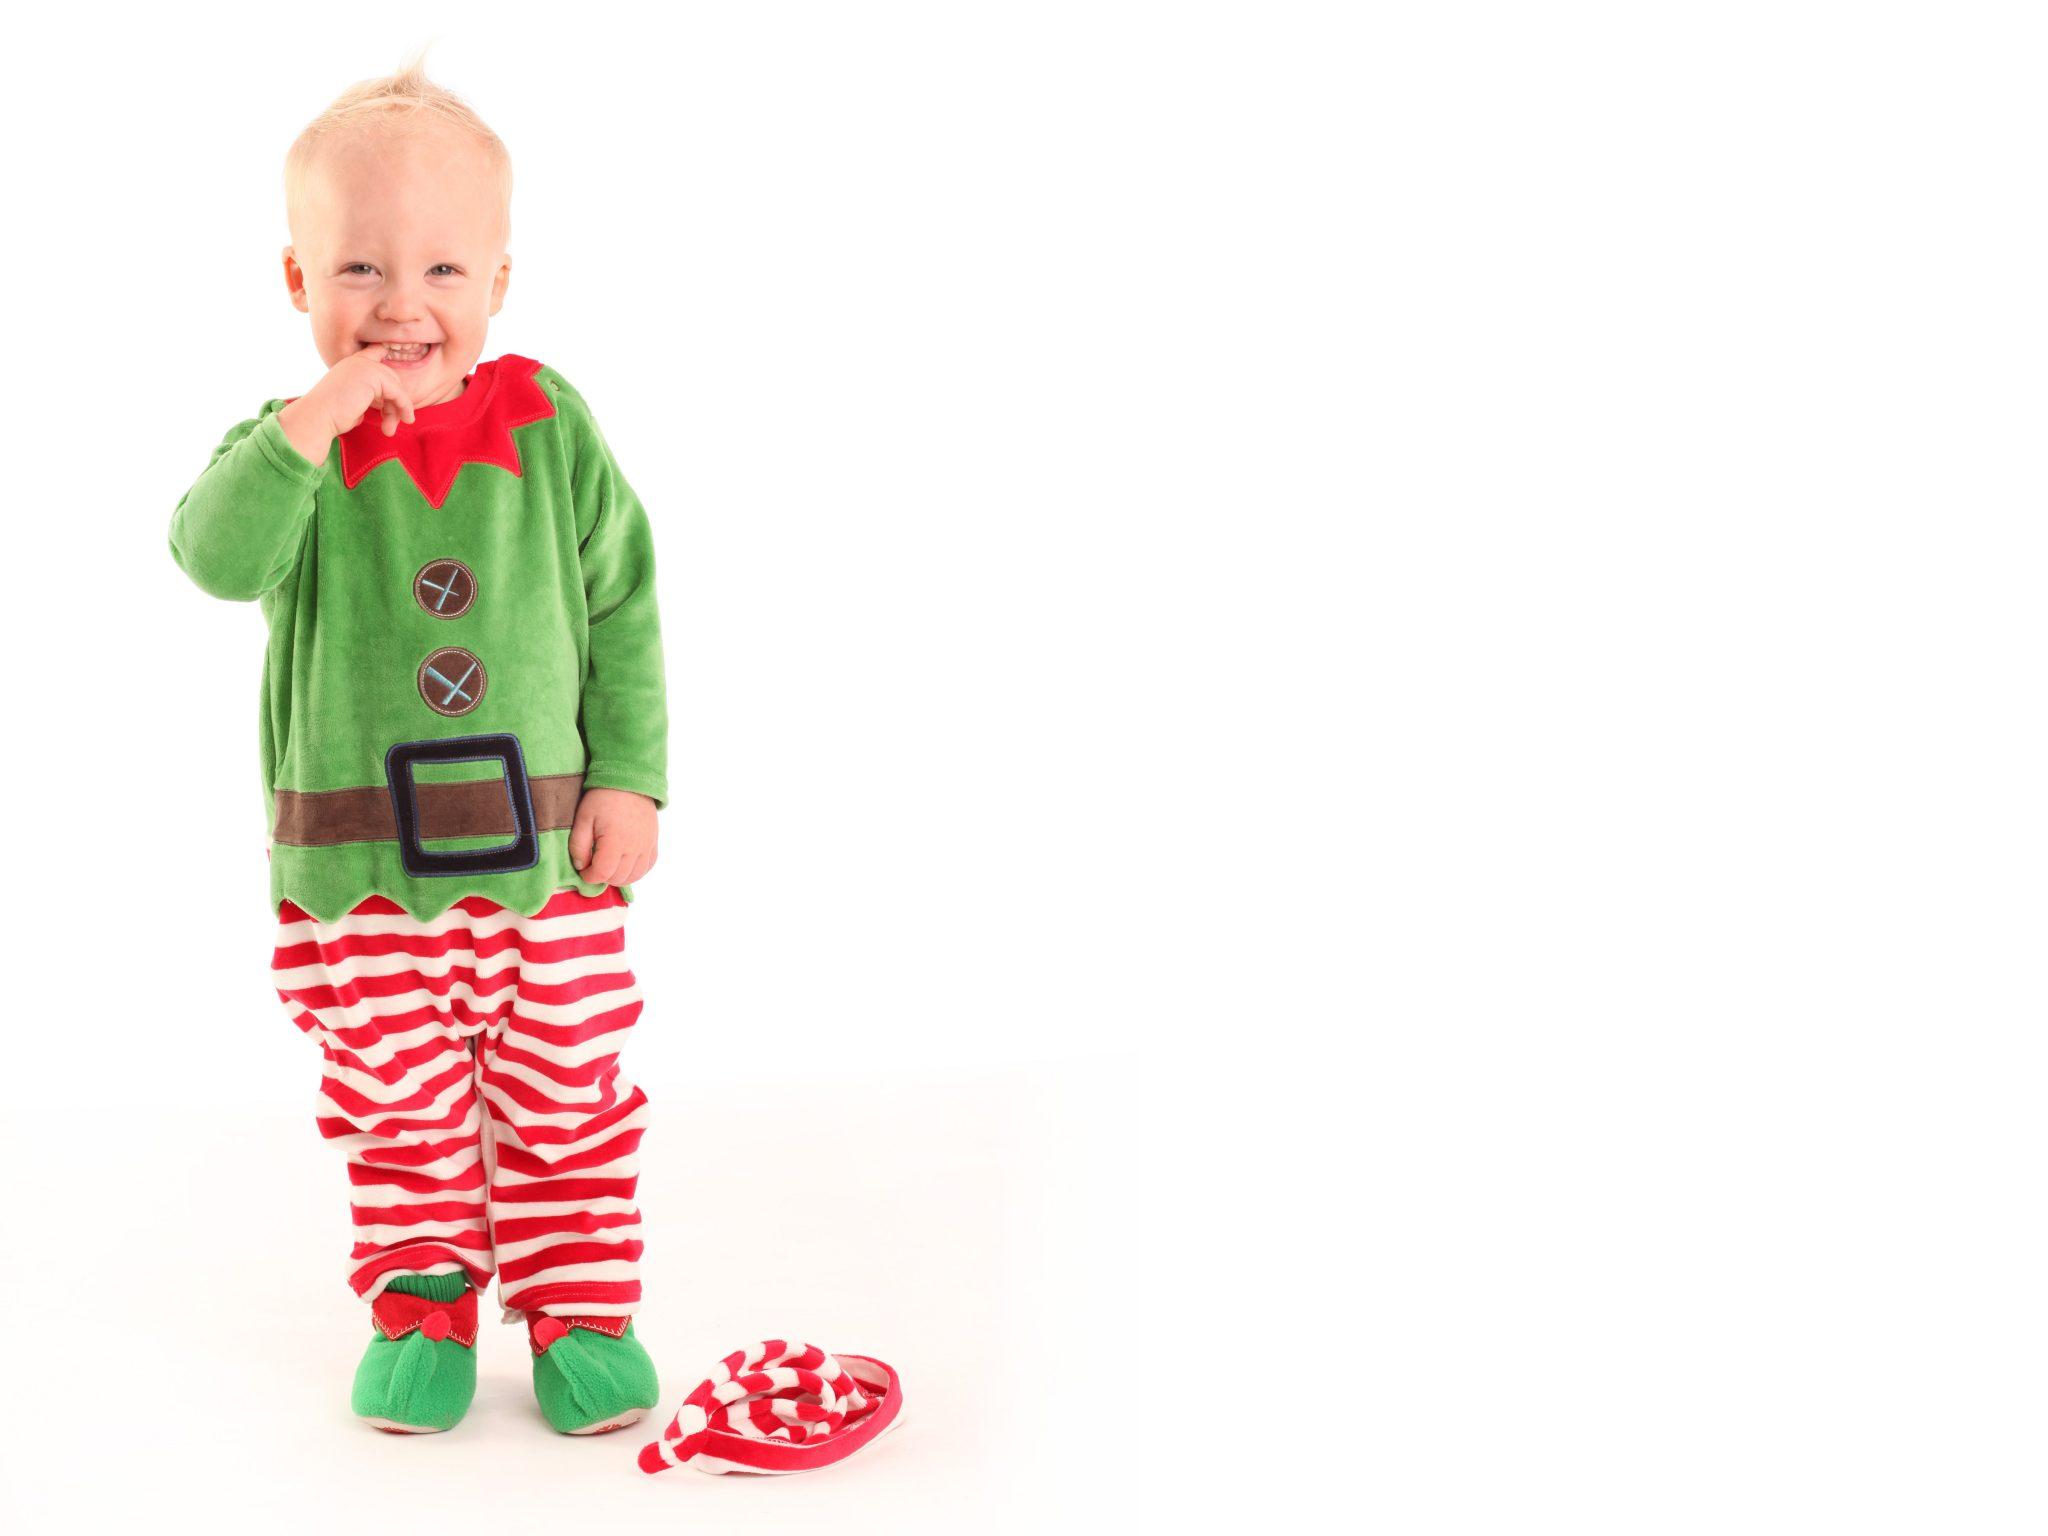 Christmas Gift: Family Portrait Dublin little elf www.1portrait.ie